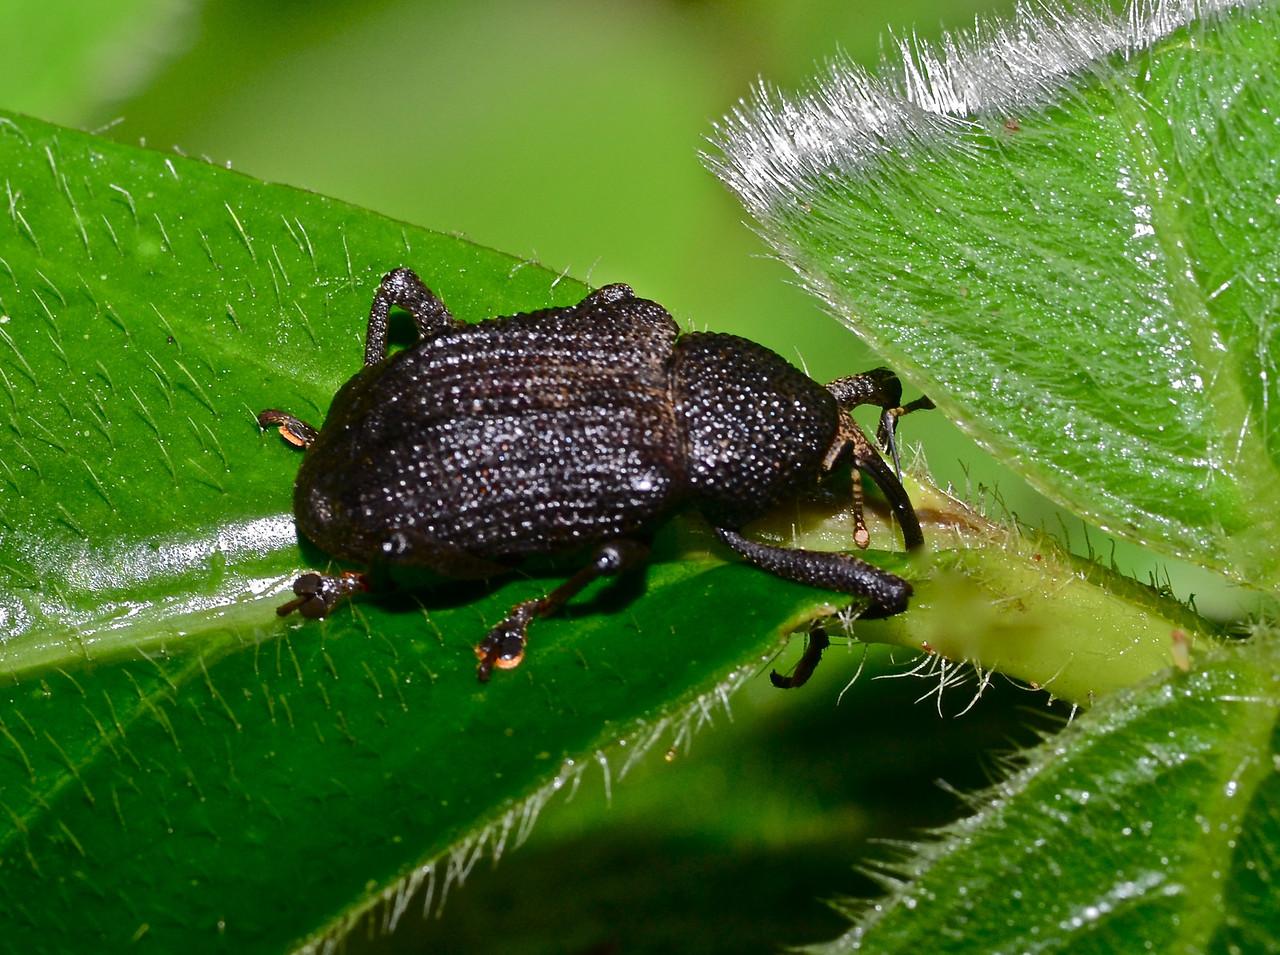 Weevil, exact species unknown